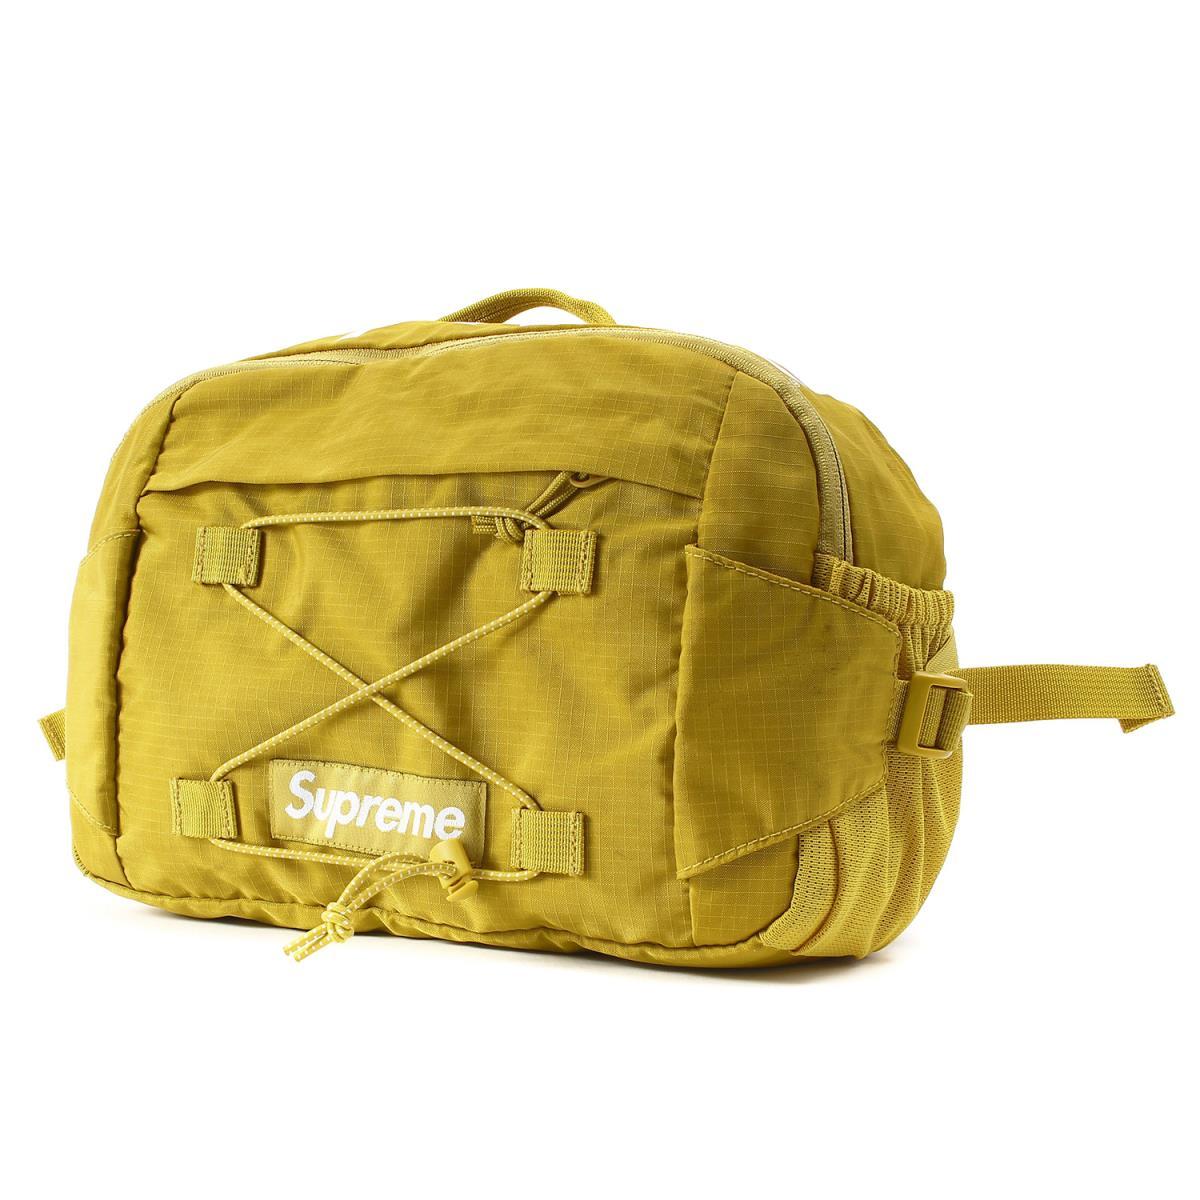 Supreme (シュプリーム) 17S/S リップストップナイロンウエストバッグ(Waist Bag Ripstop Nylon) アシッドグリーン 【メンズ】【K2180】【中古】【あす楽☆対応可】